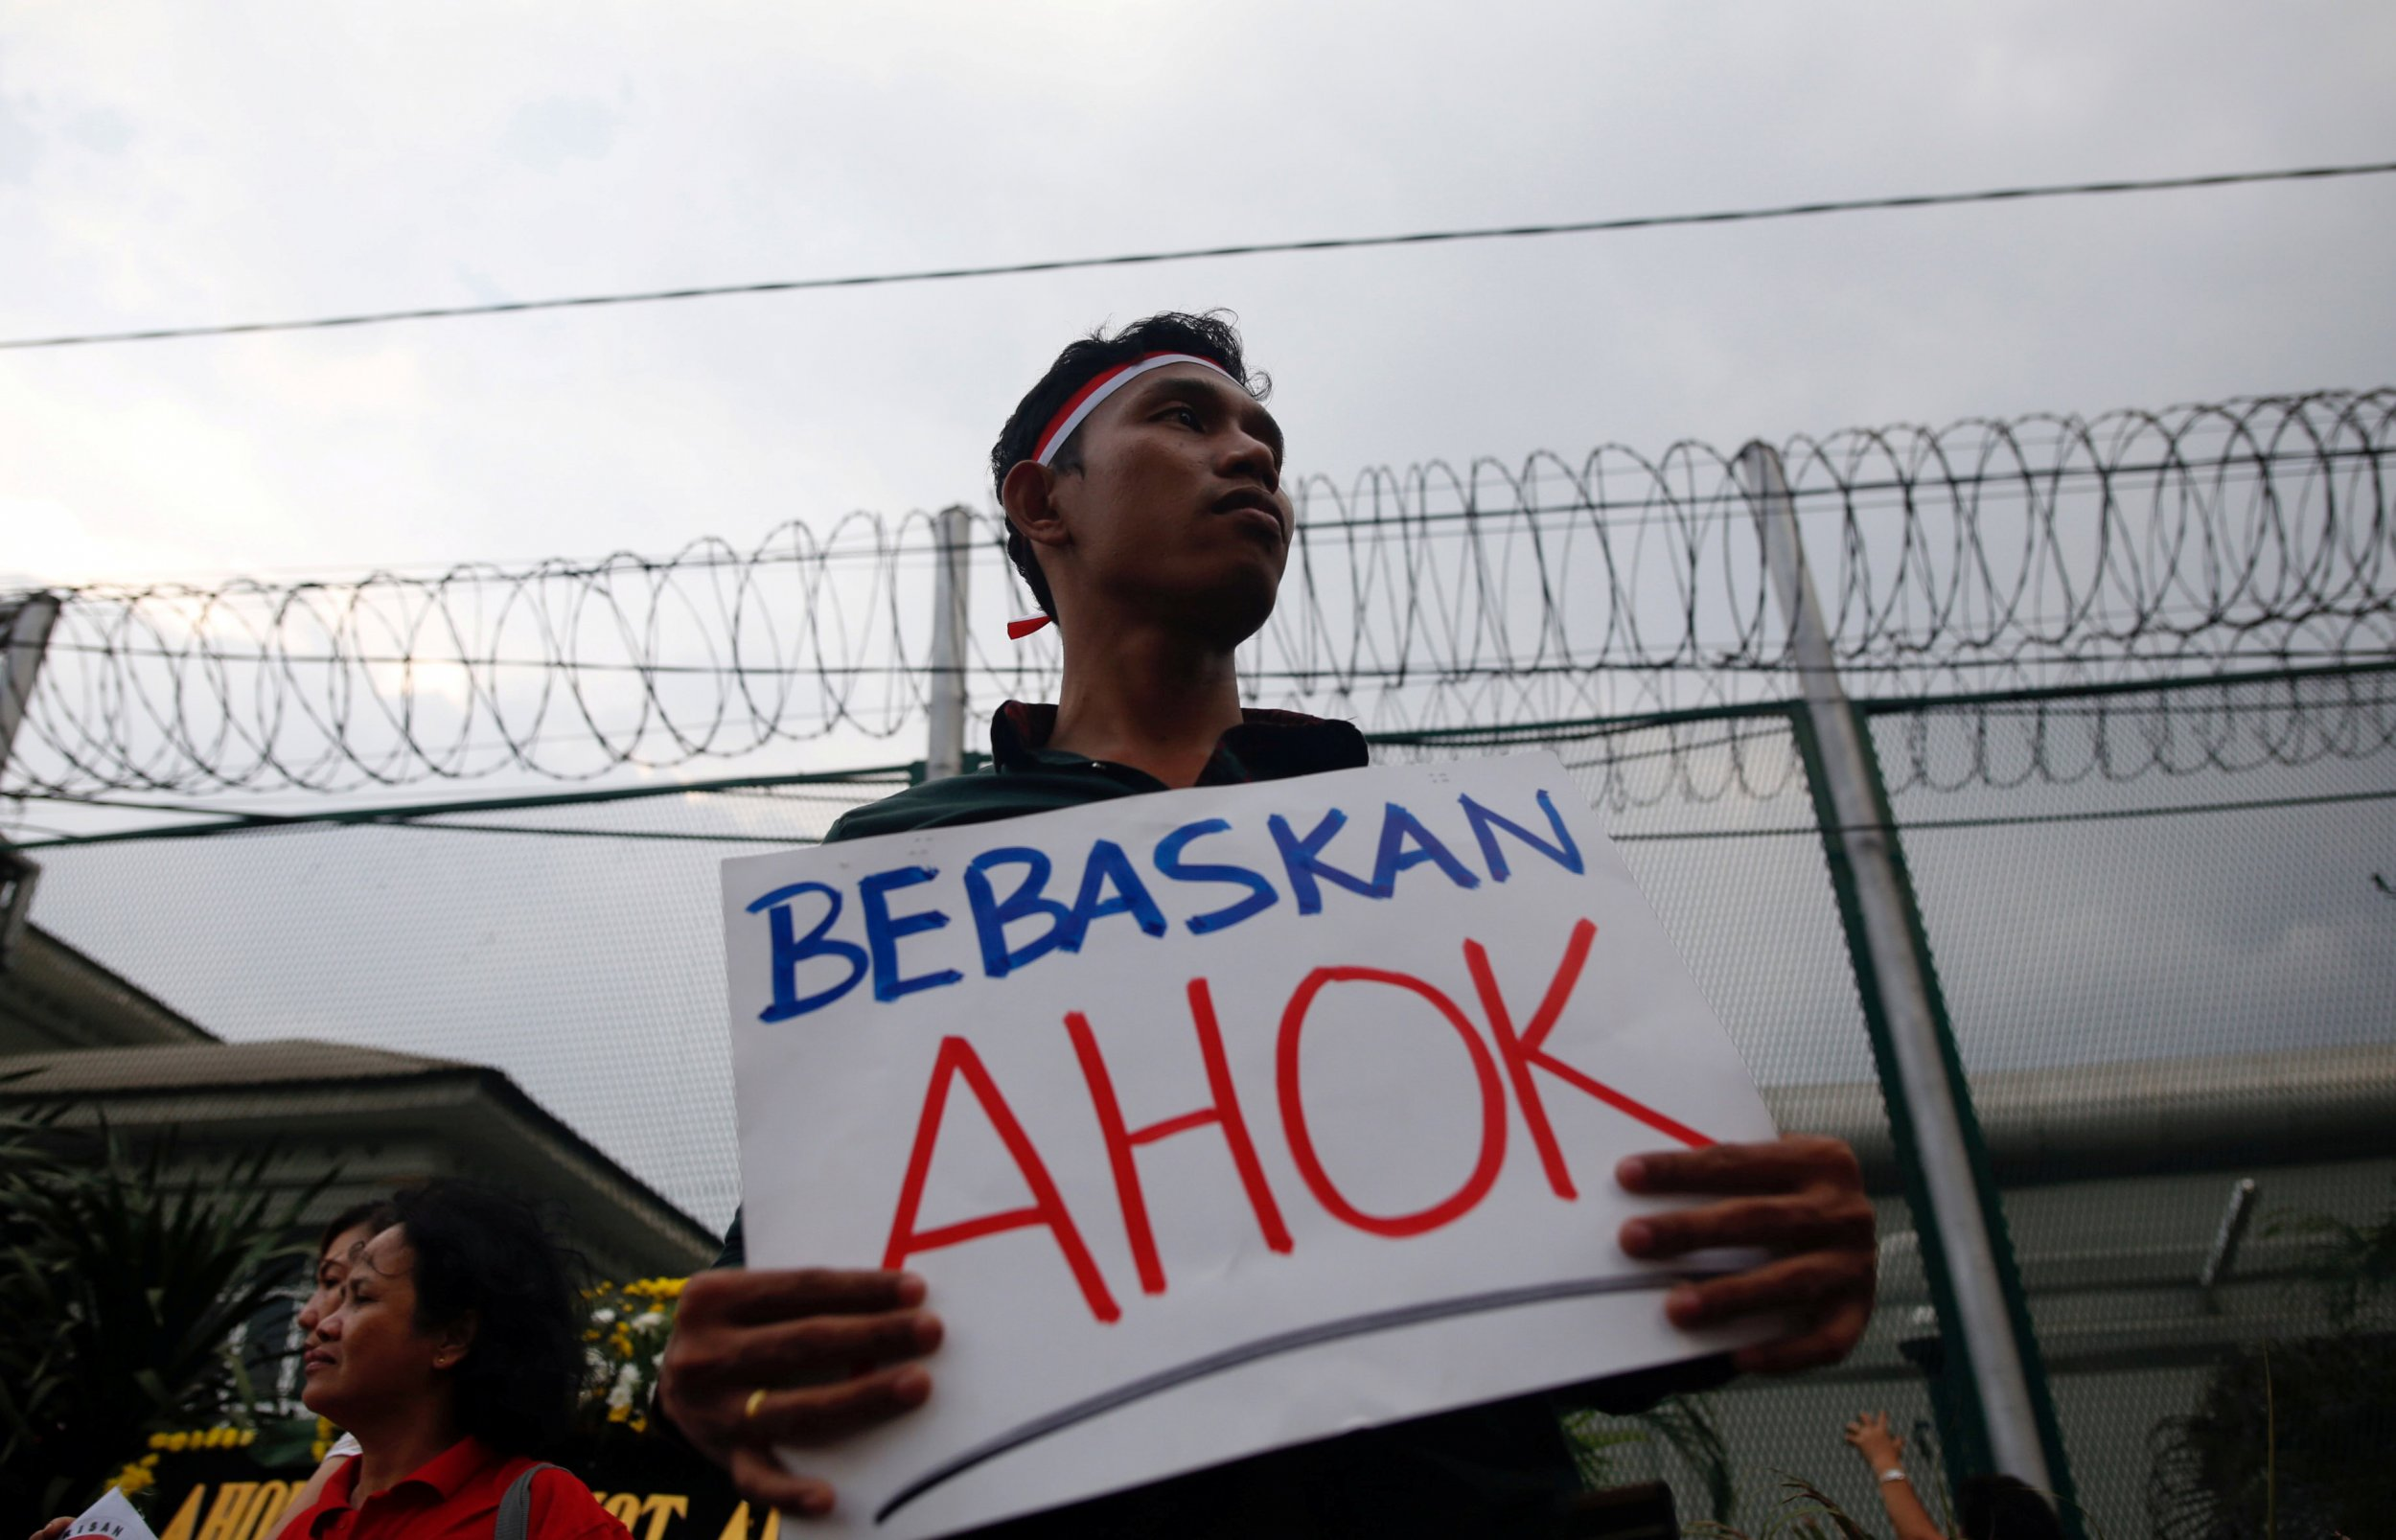 Jakarta governors blasphemy conviction shows democracy and man protesting ahok stopboris Gallery